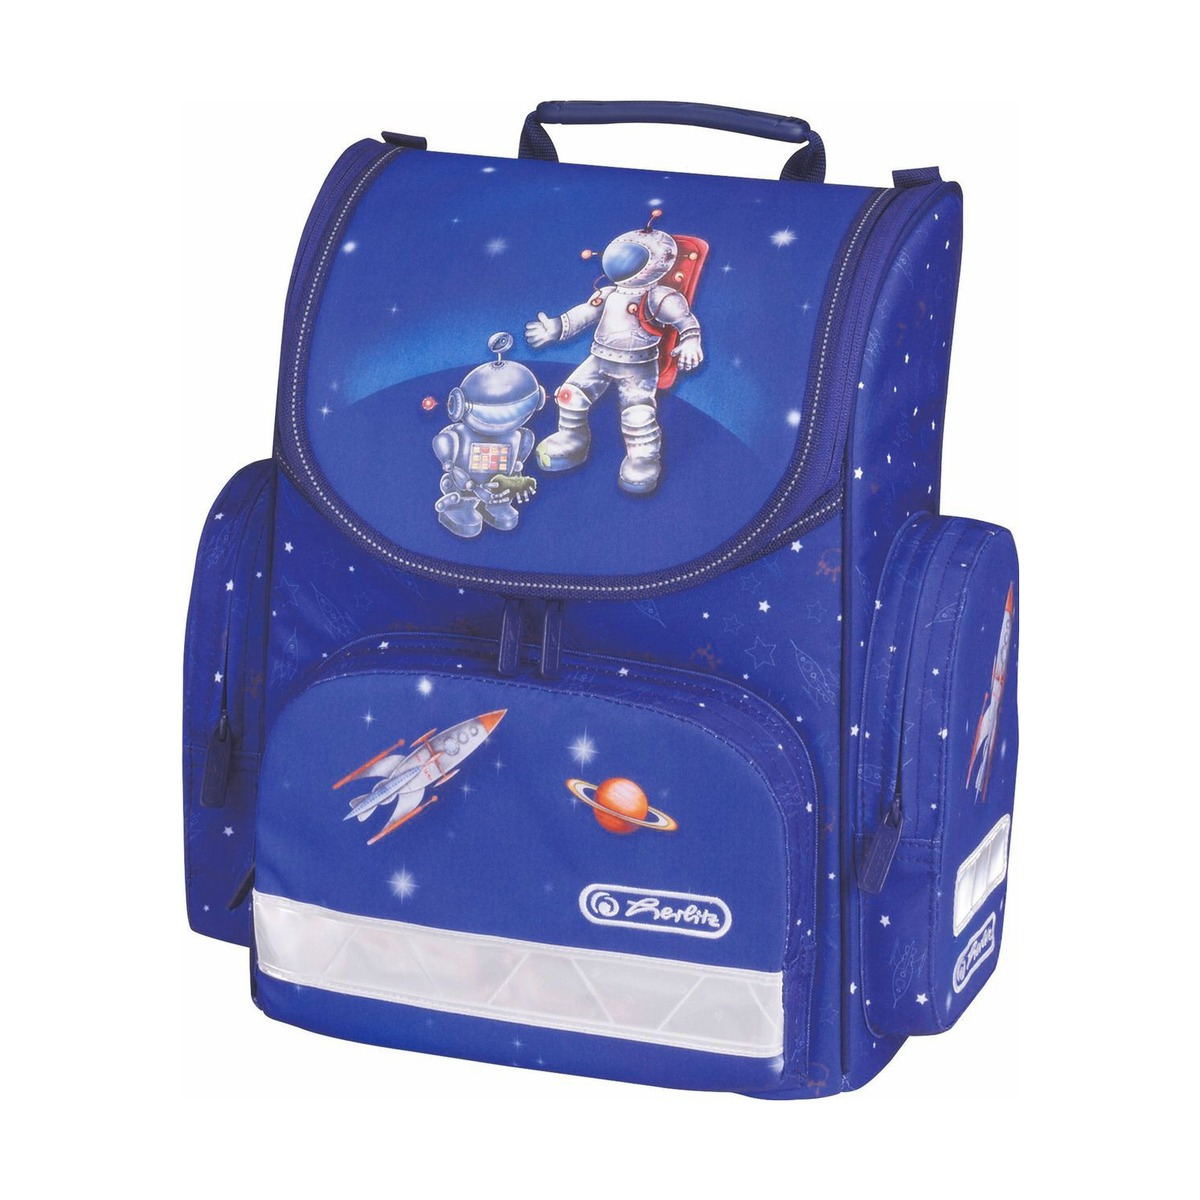 Ранец Herlitz Mini Astranaut без наполнения Космонавт + пенал в подарок, - фото 1